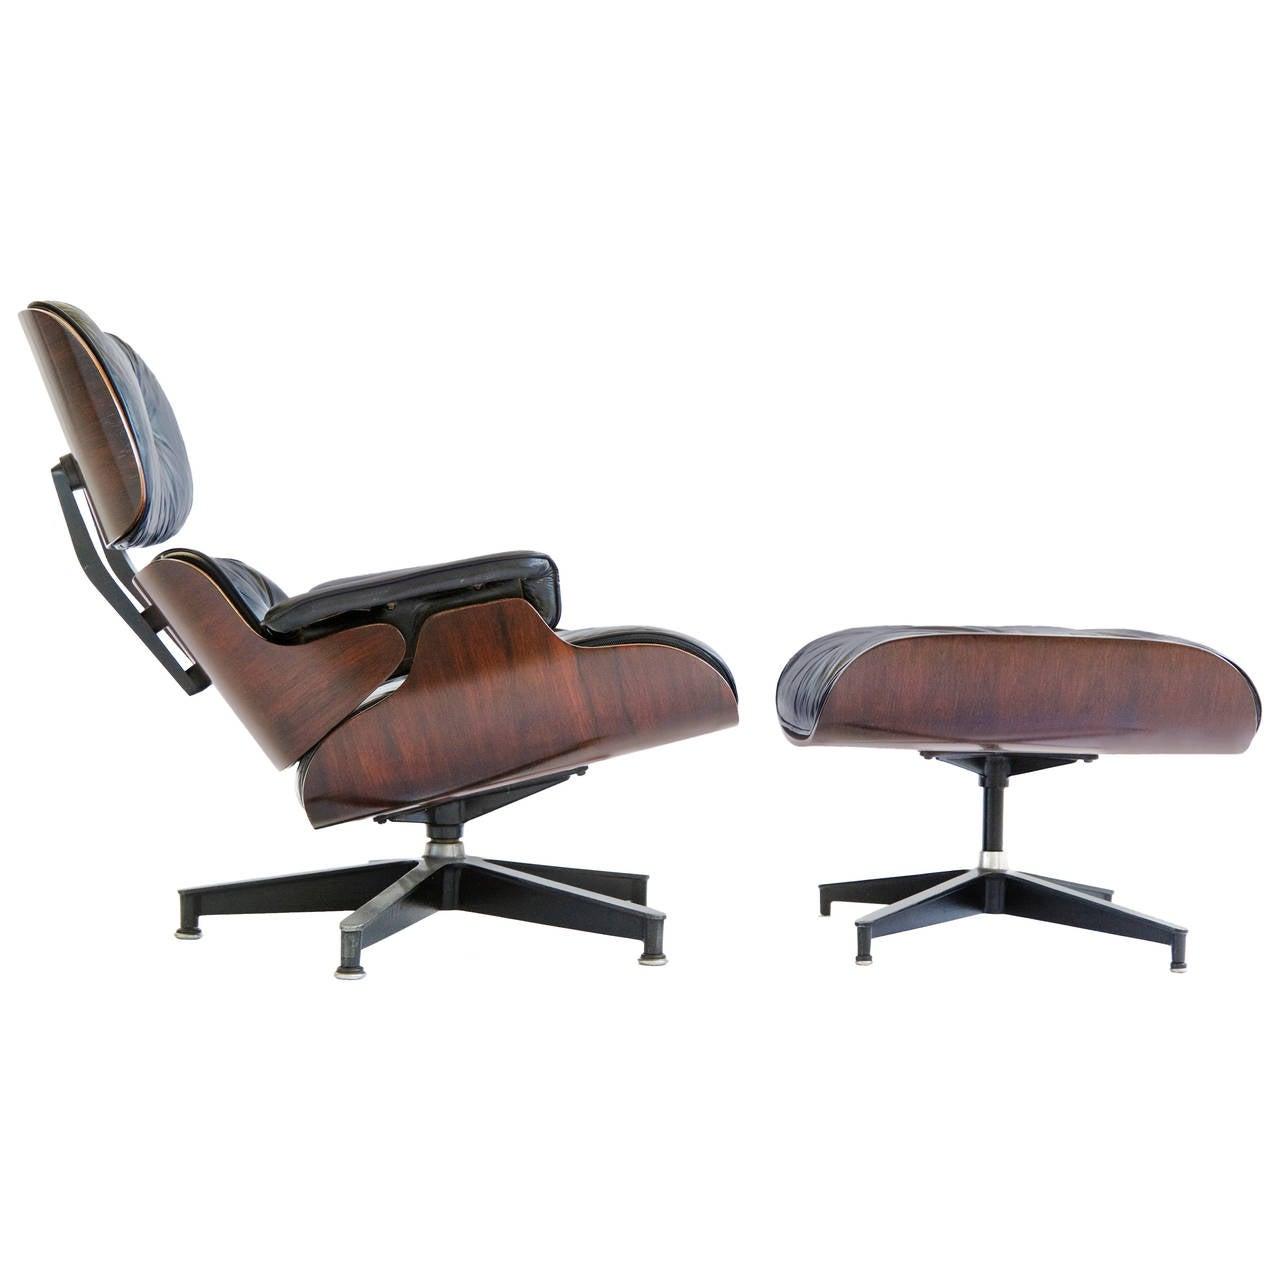 Eames 670 Lounge Chair and Ottoman at 1stdibs